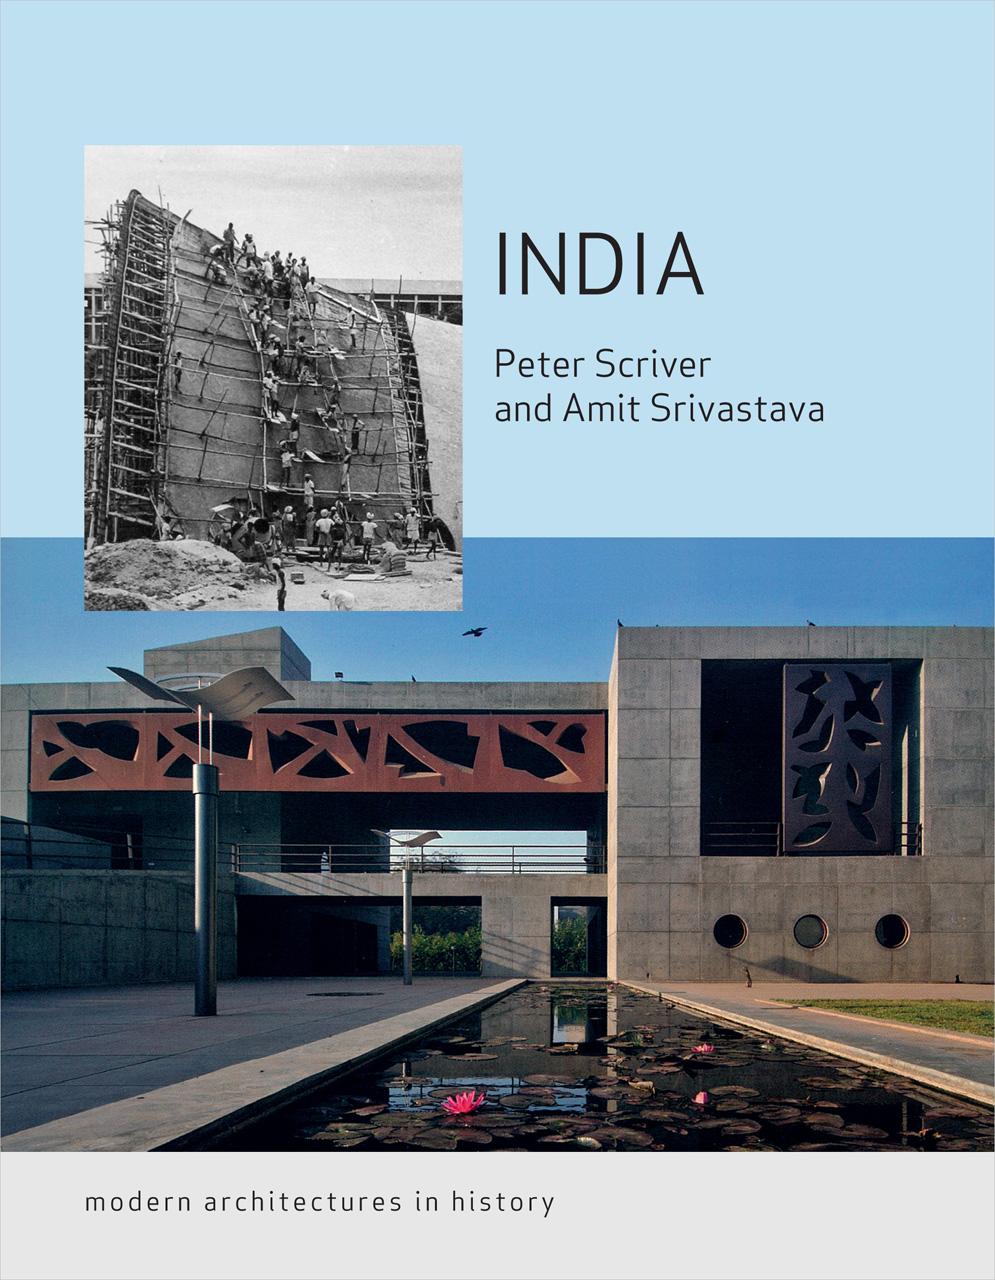 Building Modern India   (Image  ©   Peter Scriver & Amit Srivastava  )